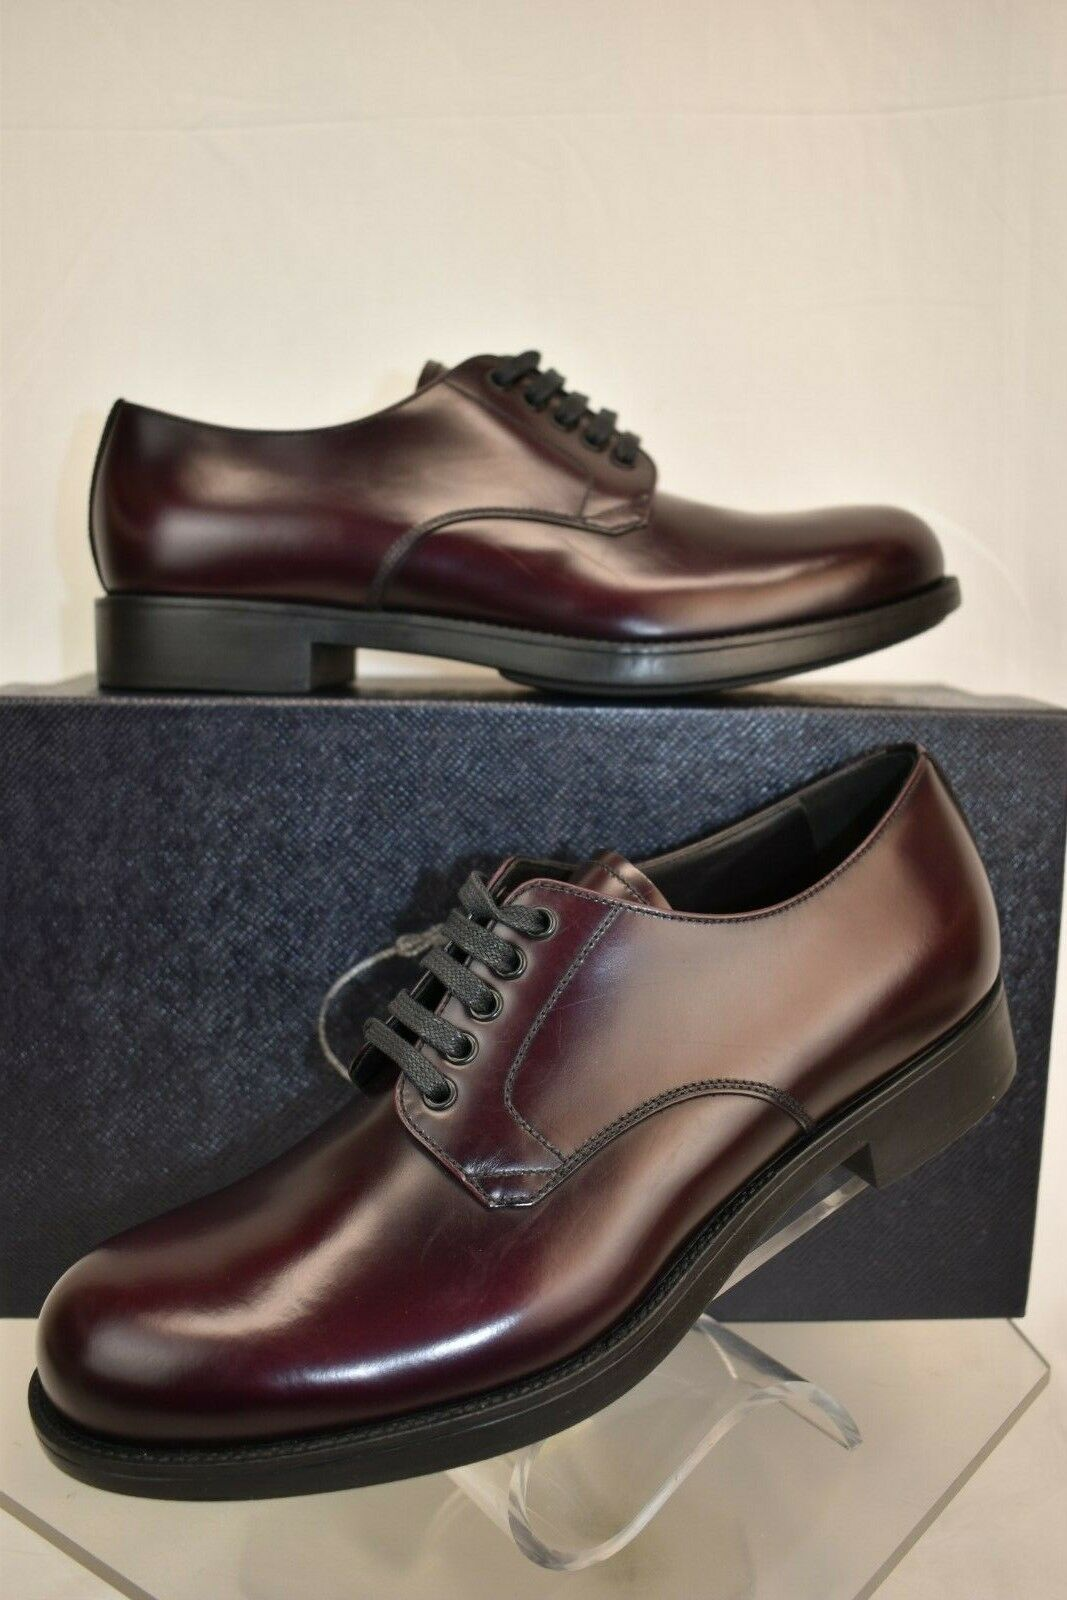 NIB PRADA BURGUNDY CORDOVAN LEATHER LACE UP CLASSIC DERBY scarpe 7 8 ITALY